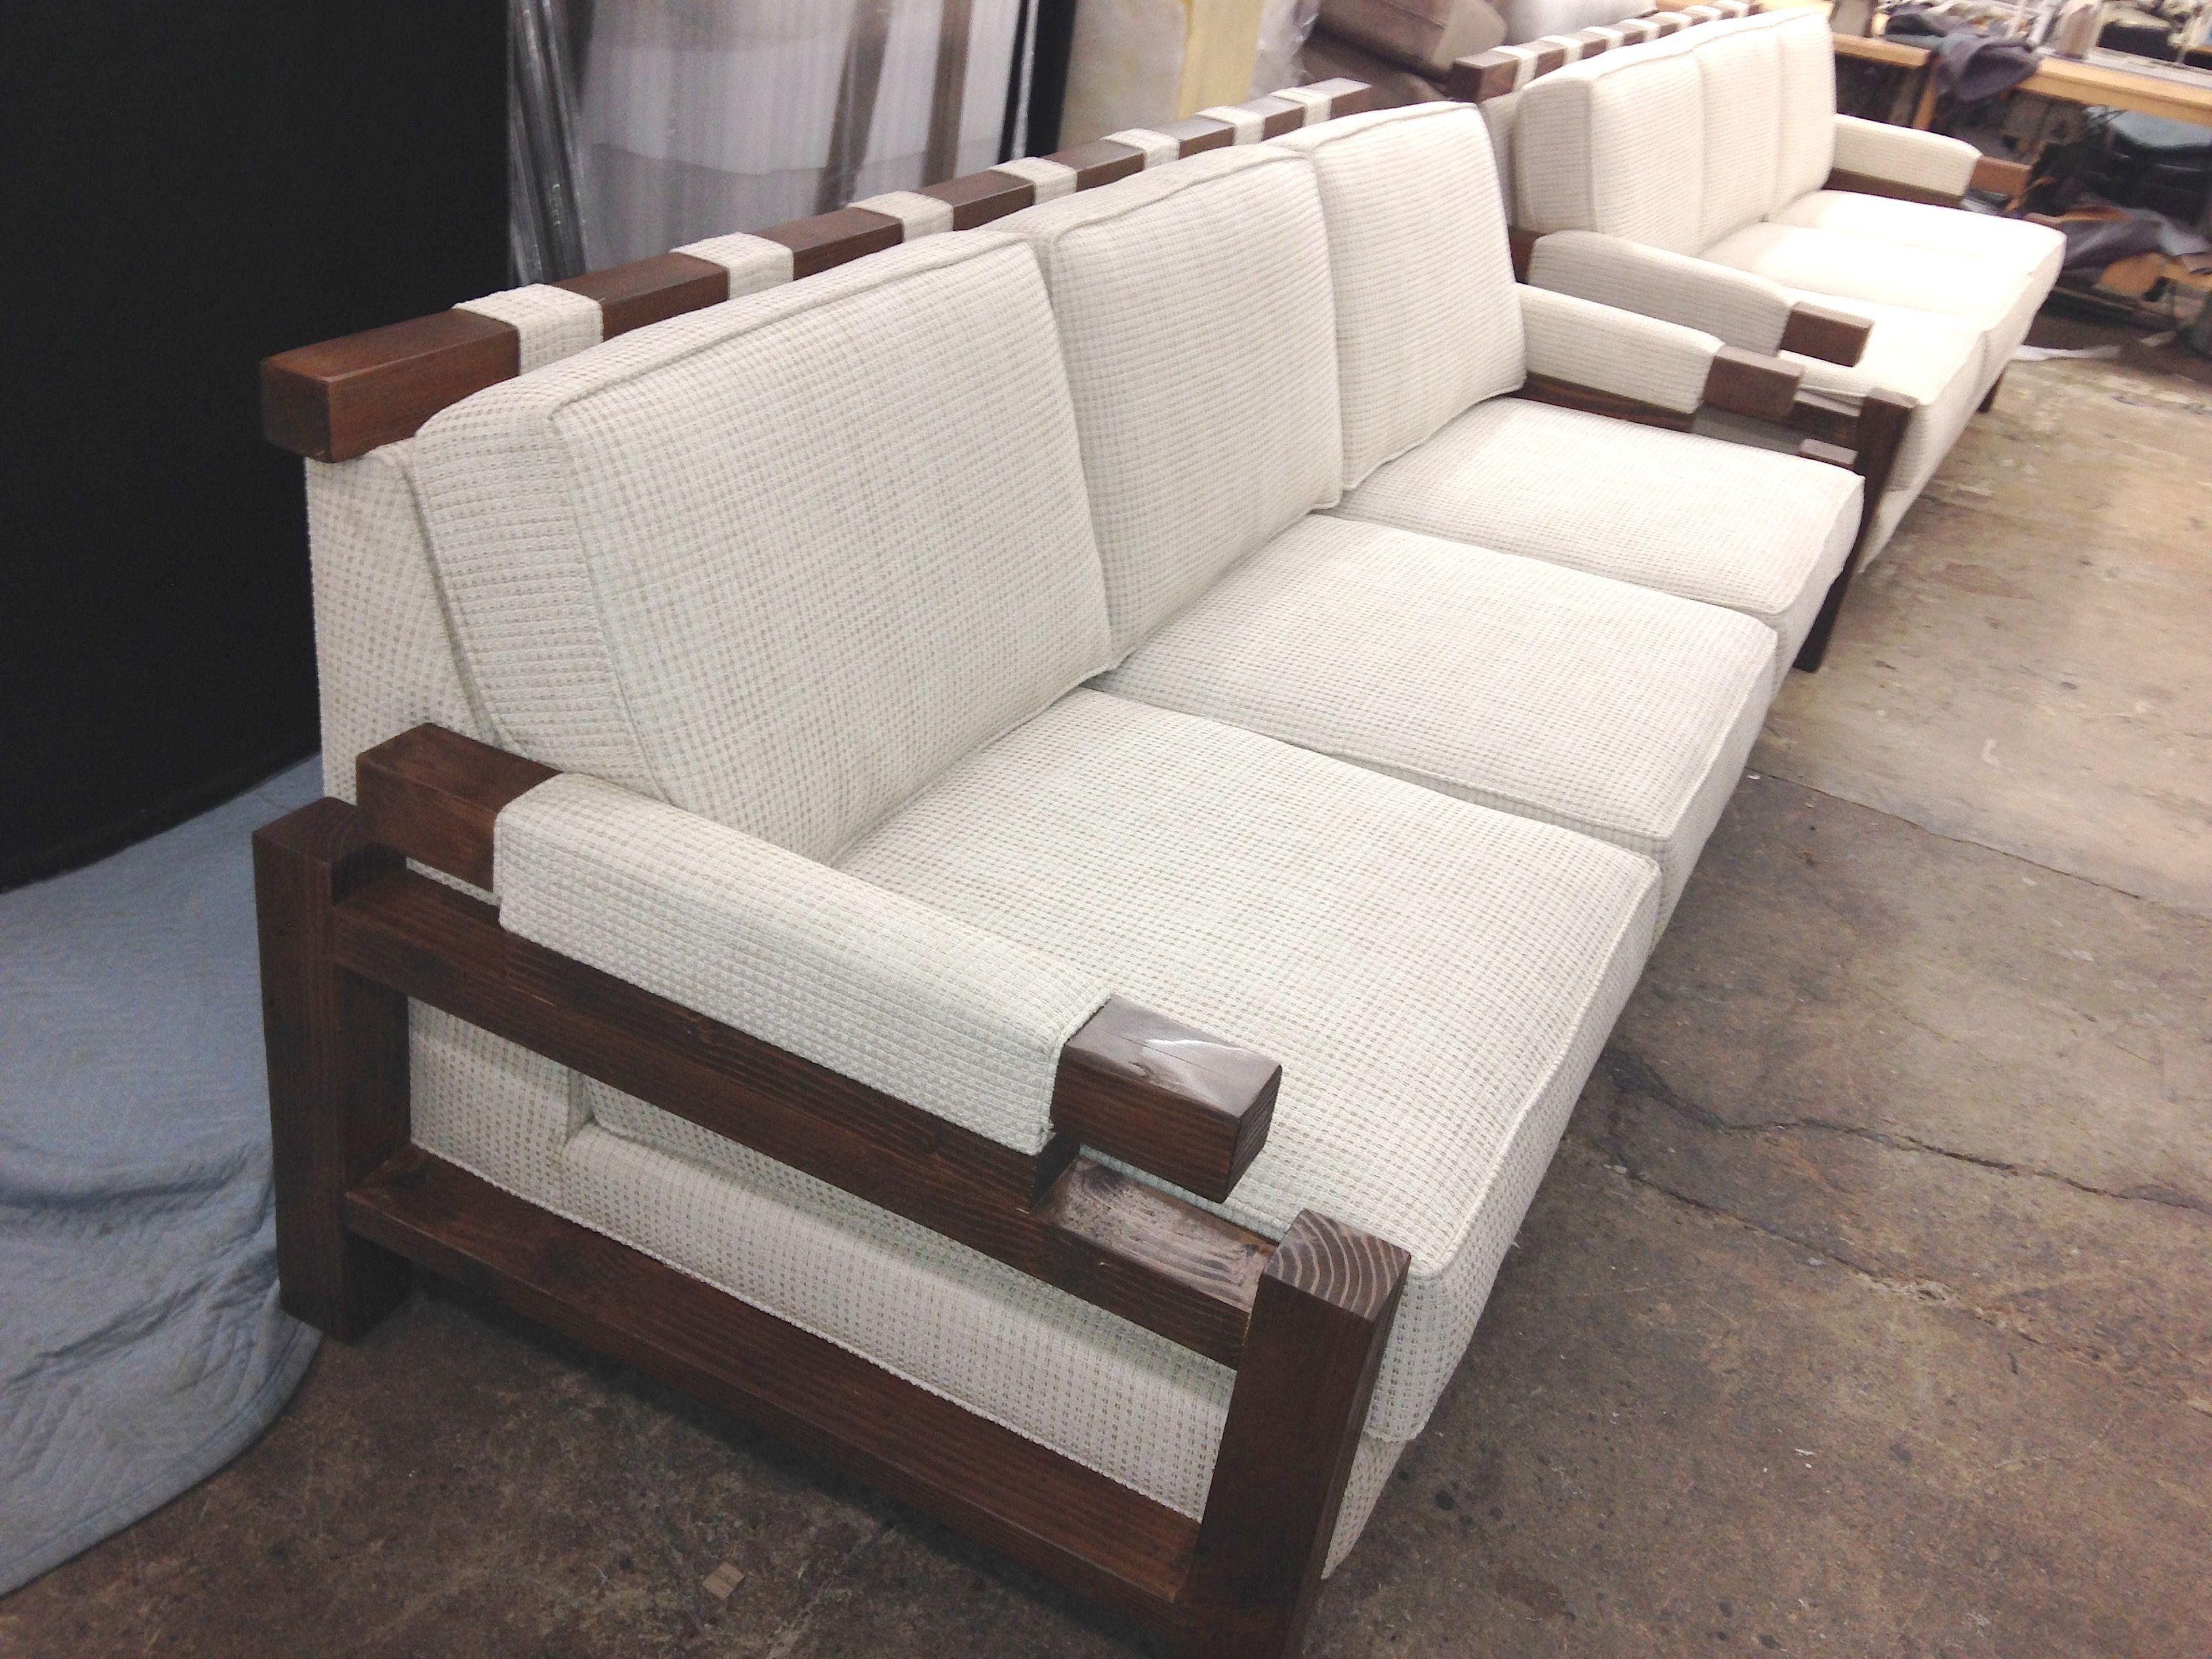 Buy A Custom Asian Inspired Sofa Design Made To Order From Interior9custom